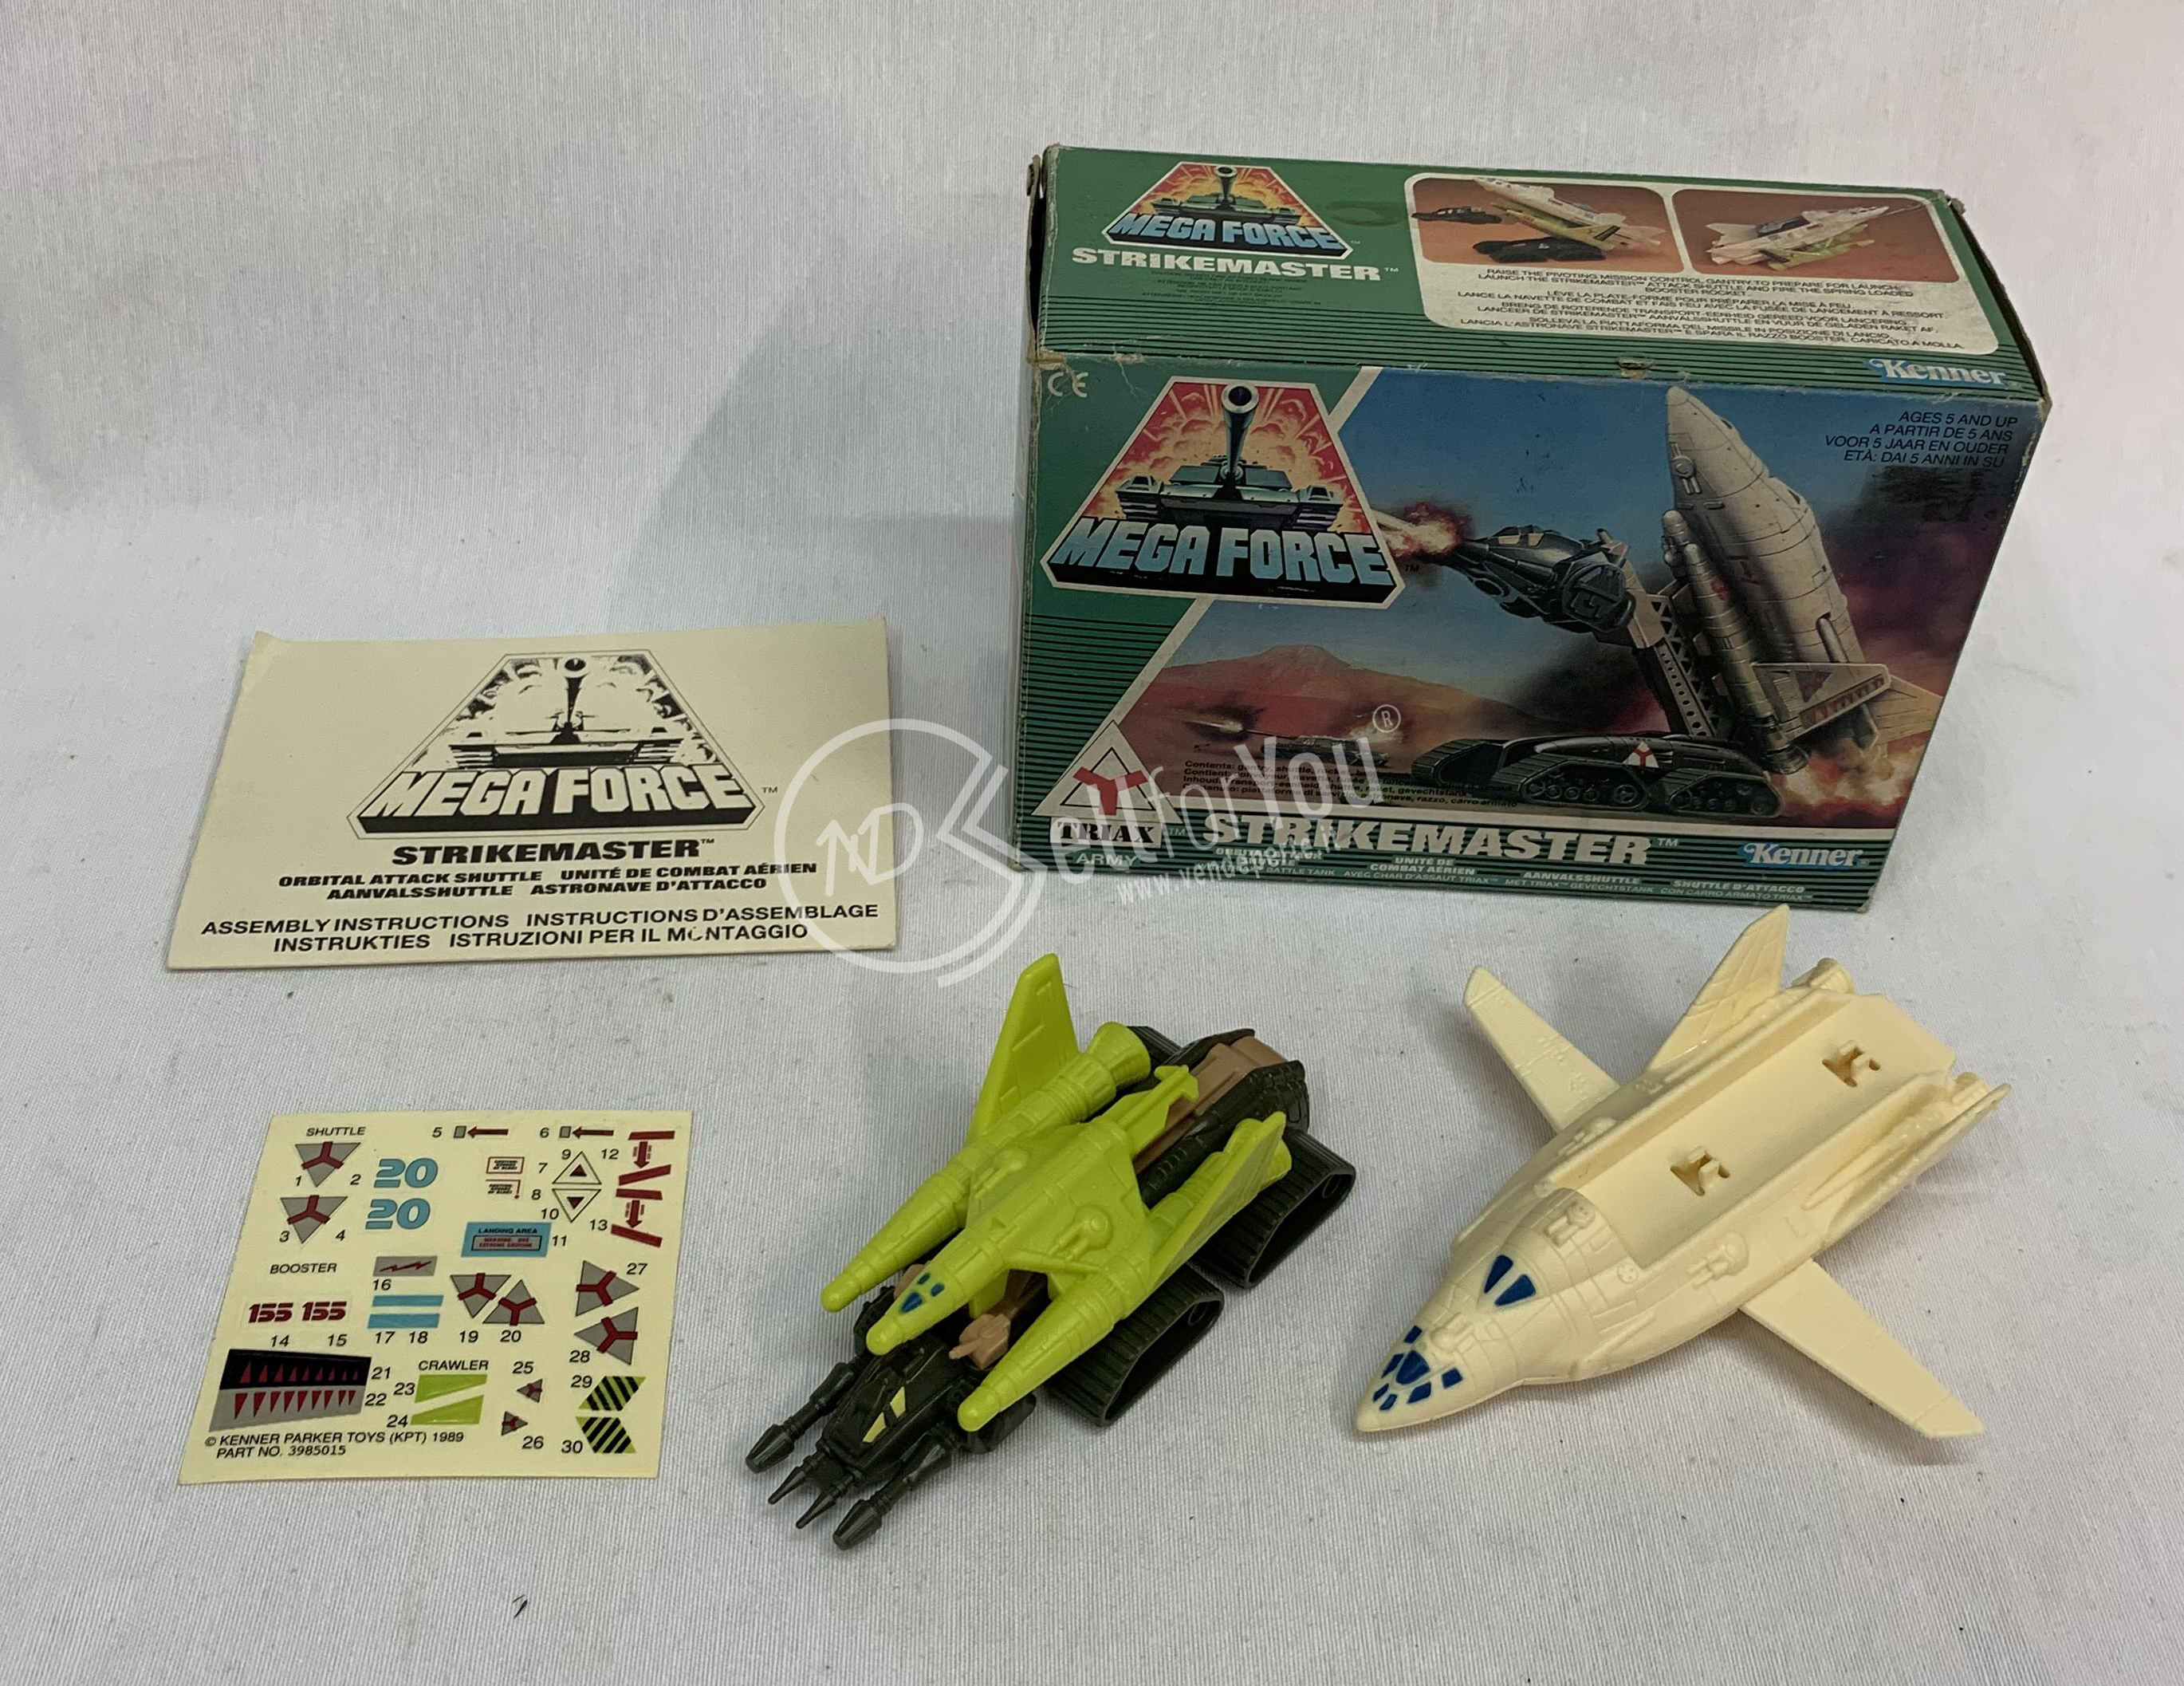 sellforyou immagine default articolo correlato non trovatoStrikemaster mega Force  Kenner anni '80 vintage